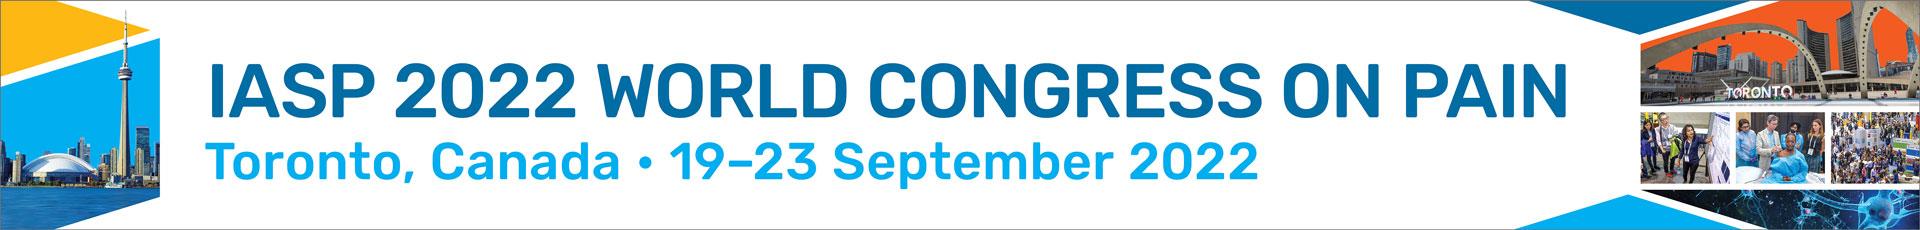 2022 IASP World Congress on Pain Event Banner